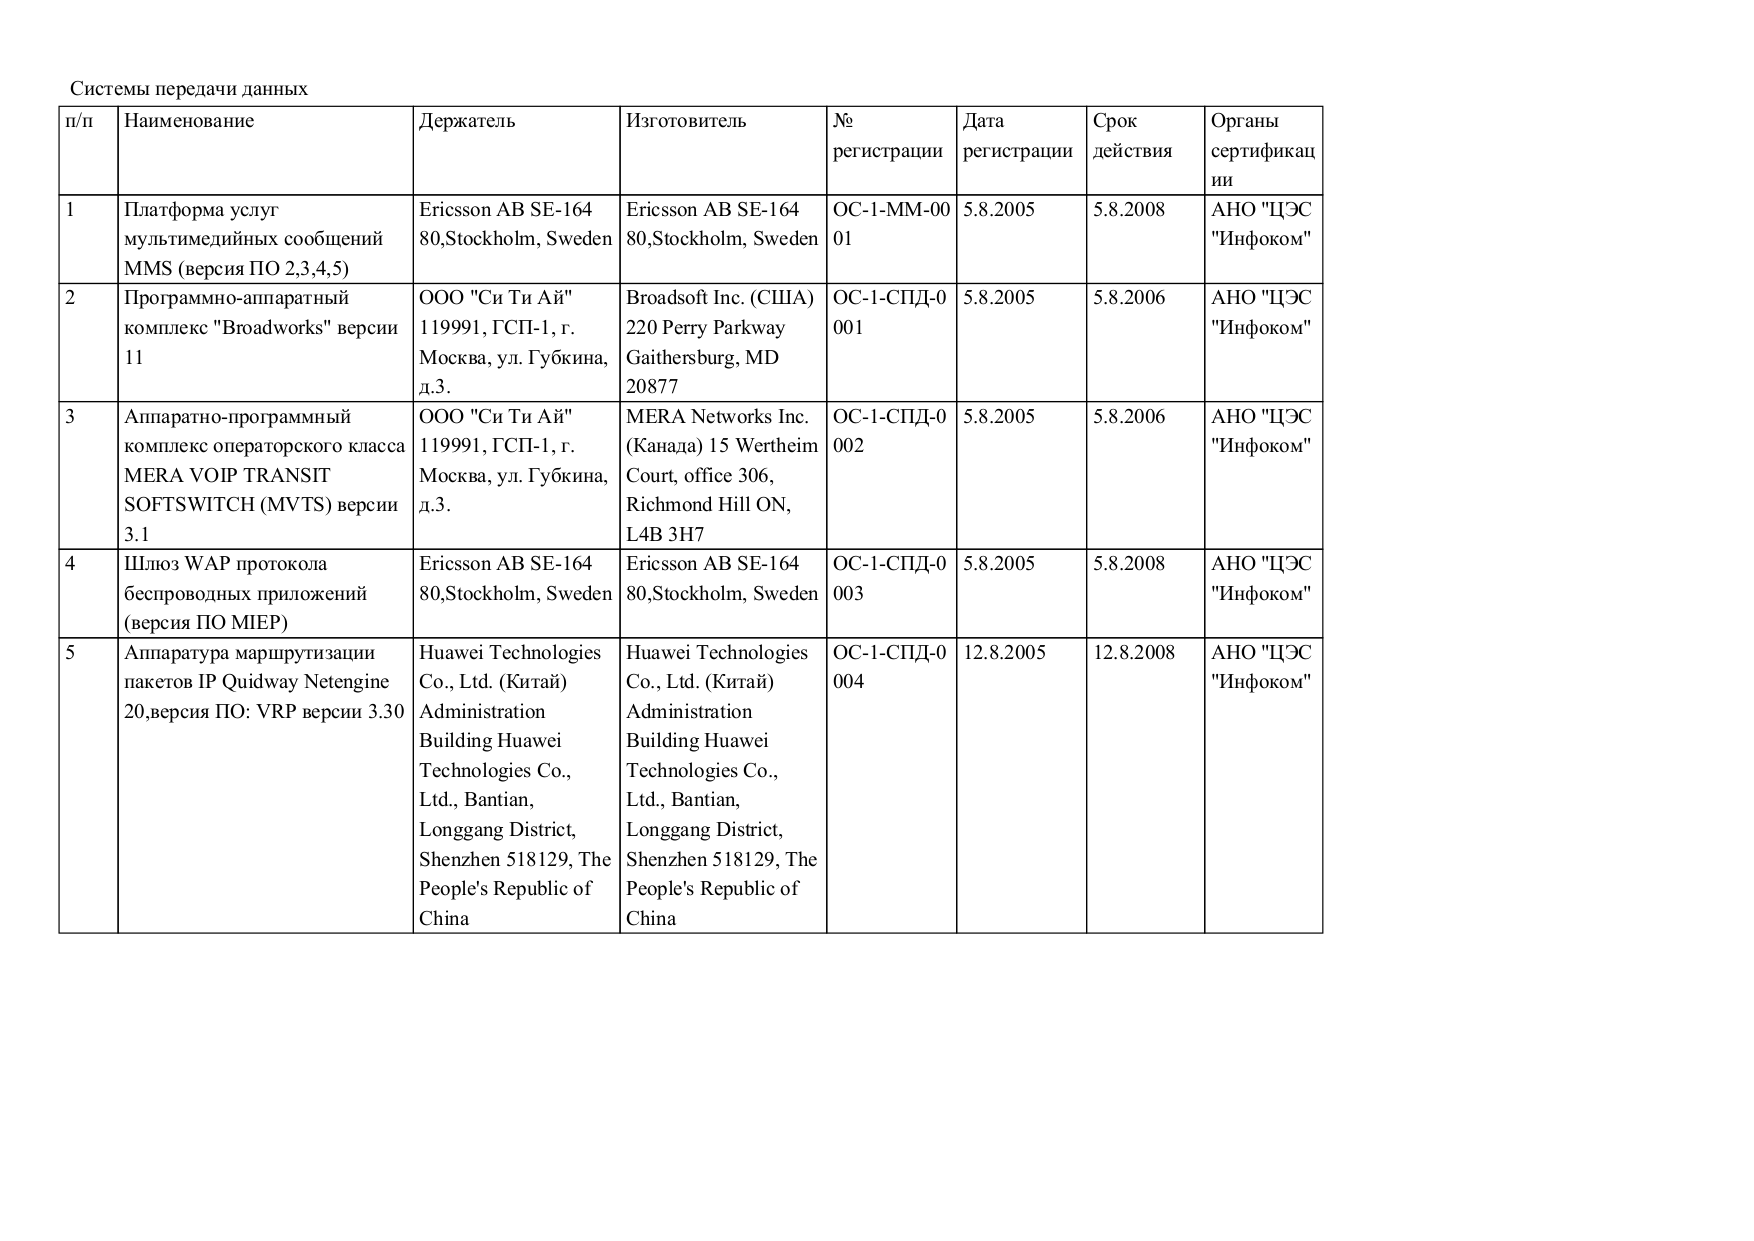 pdf for Quintum Other DX Series DX4096 Gateways manual